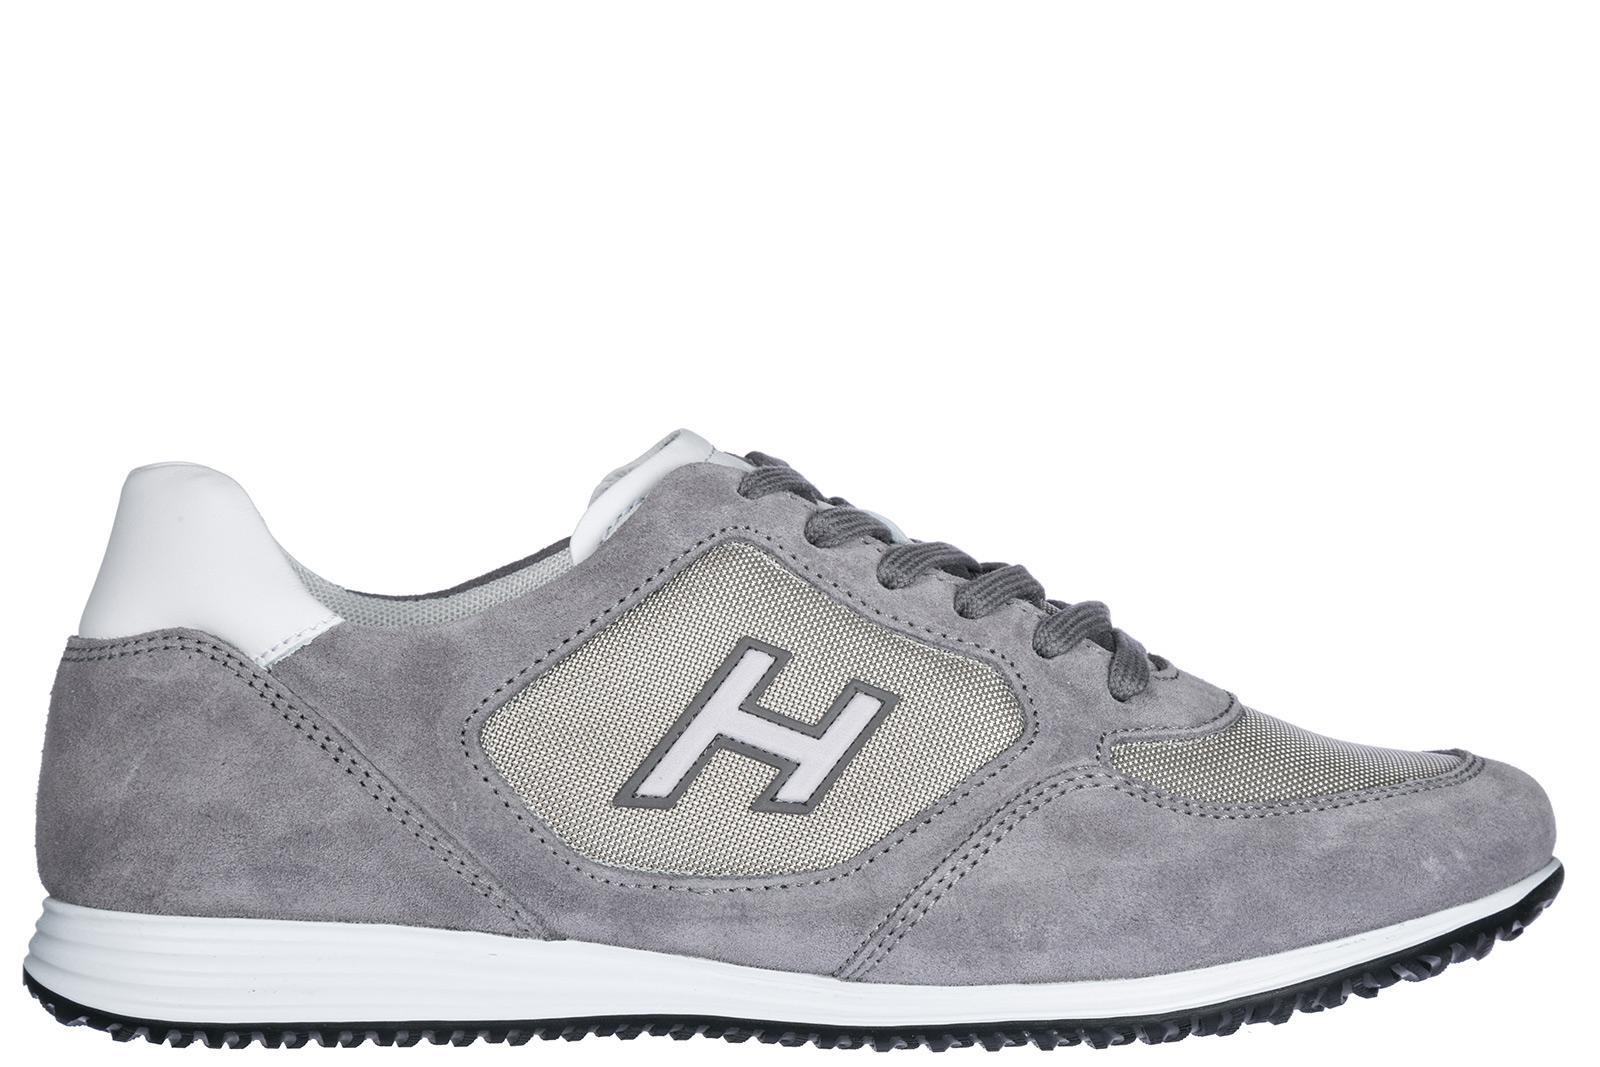 Sneaker H205 suede Logo light grey Hogan Zh4yG5NuhU